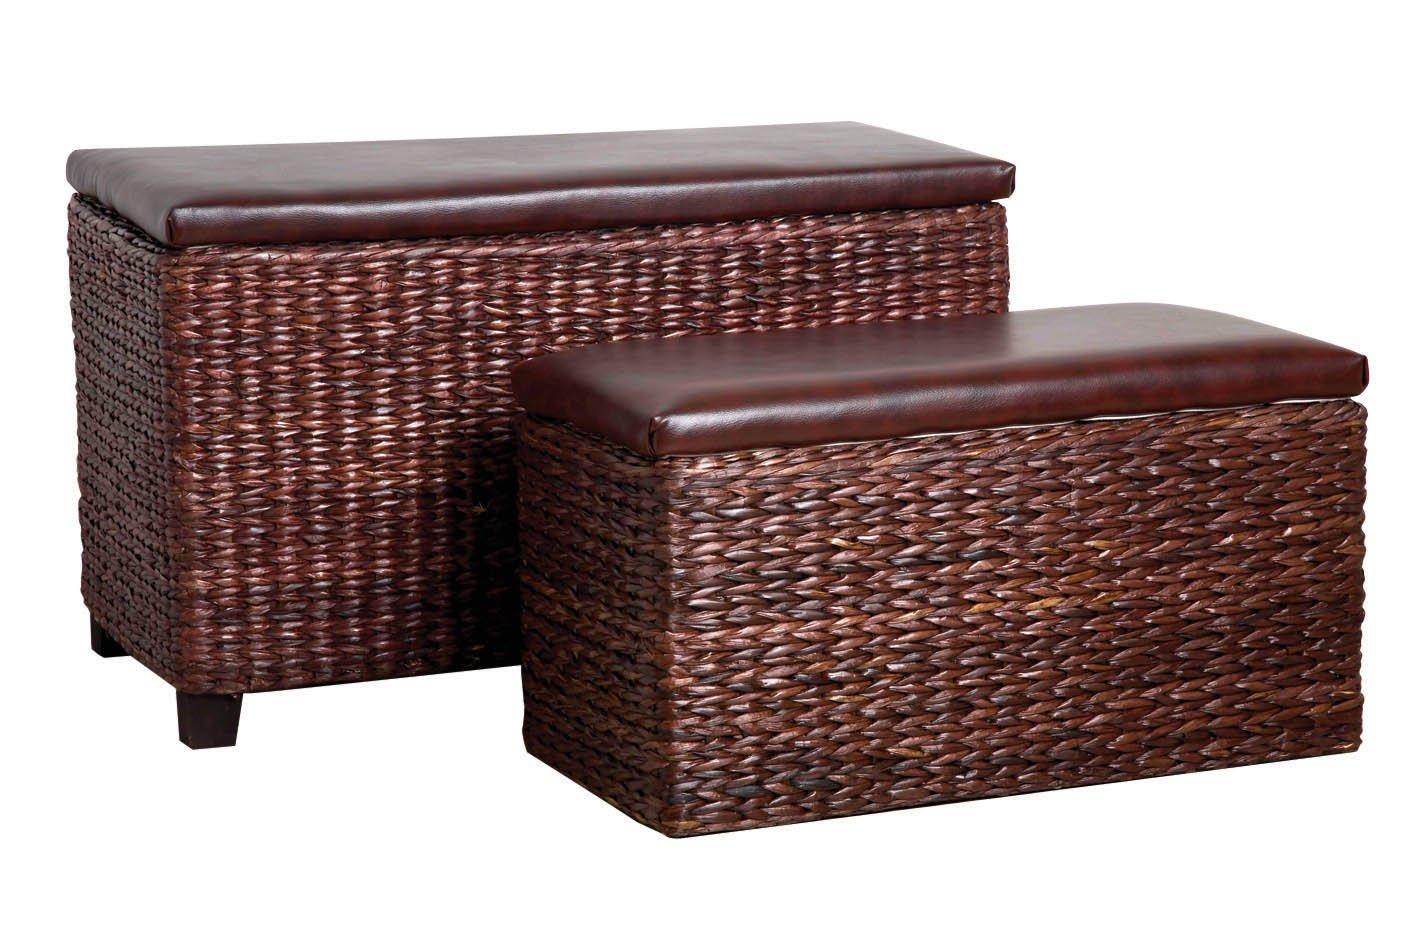 Premier Housewares Cattail Leaf Storage Seats - Set of 2, Brown 2401792